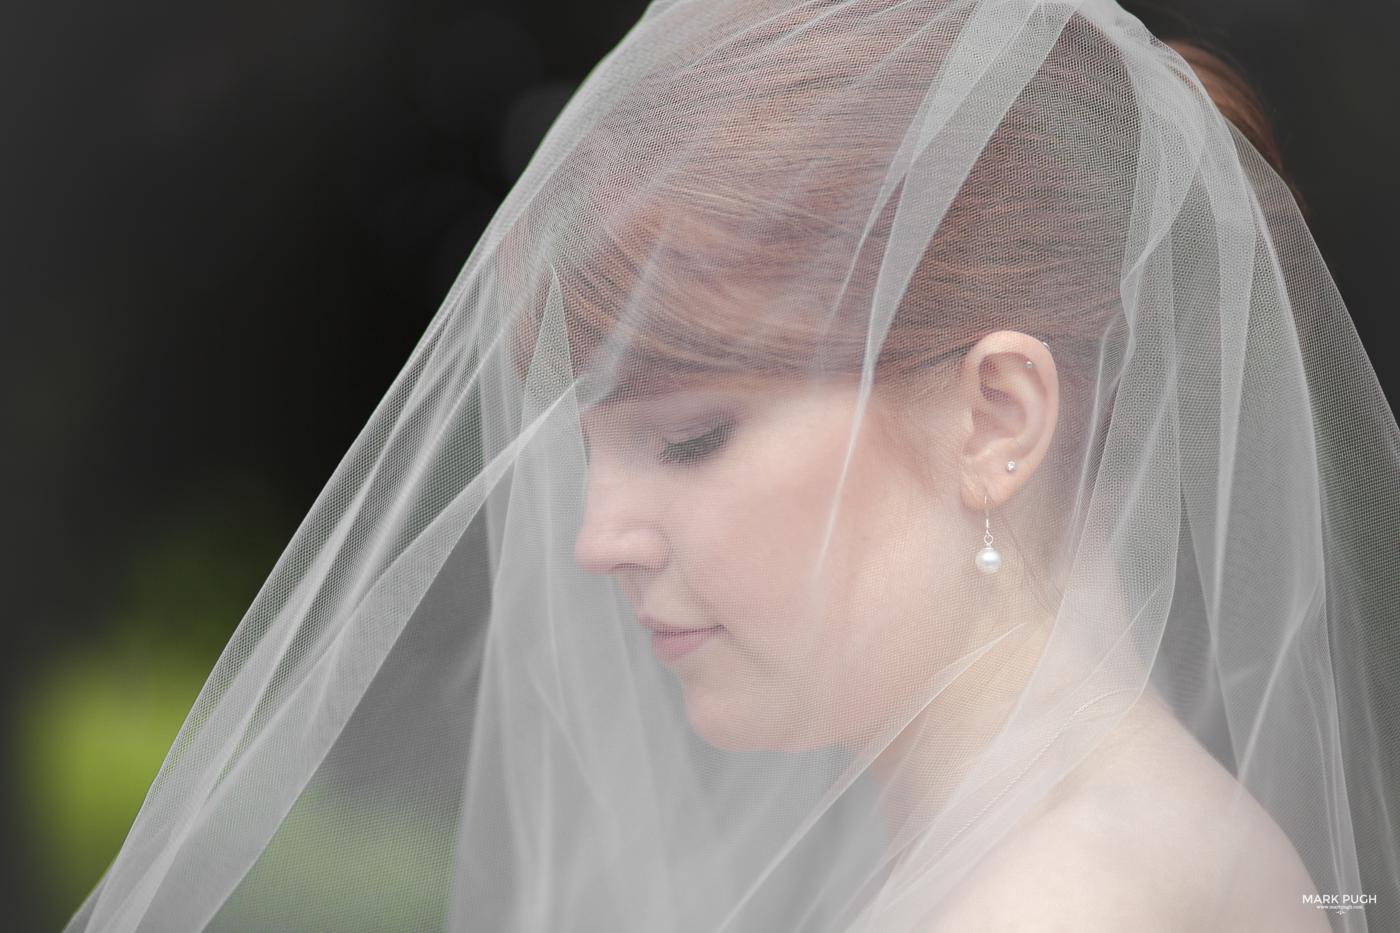 066 Wedding Photography Award winning Wedding Photographer and Videographer Mark Pugh www.markpugh.com.JPG